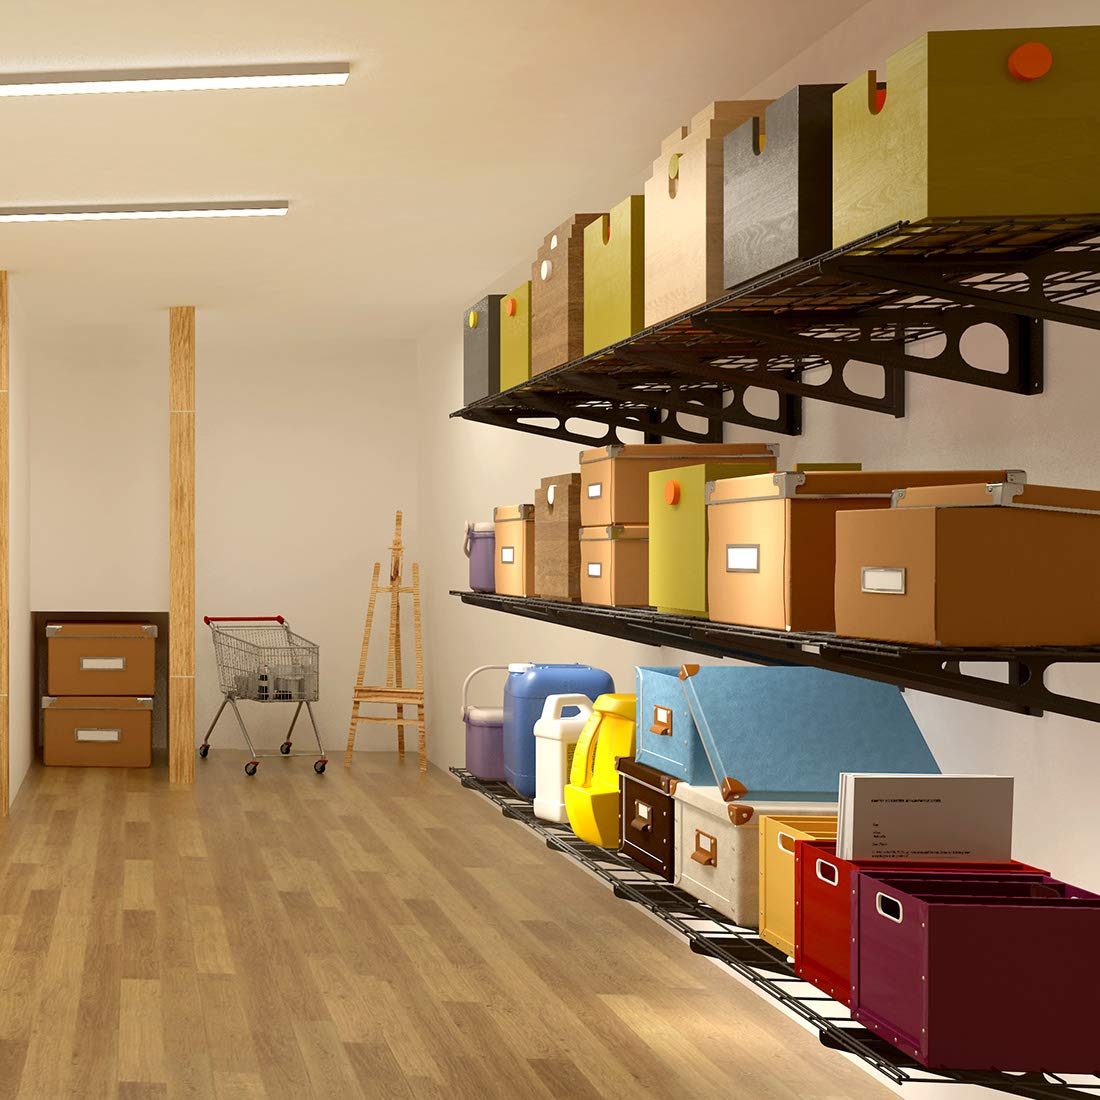 Flexible Garage Wall Storage: Wall Shelf Garage Storage Rack Wall Mounted Floating